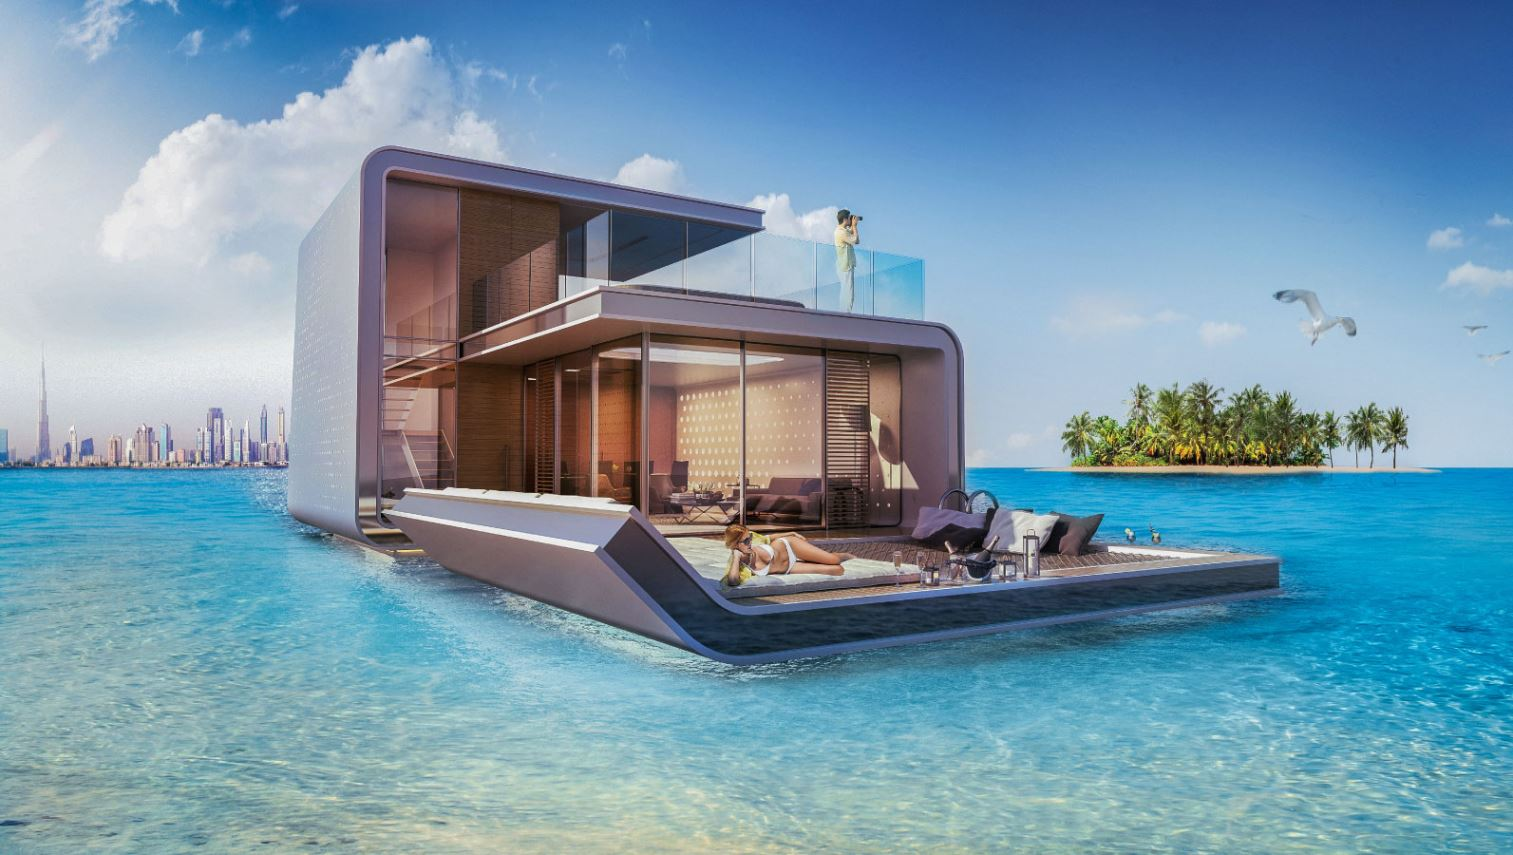 На выставке Cityscape будет представлен проект футуристических домов на воде